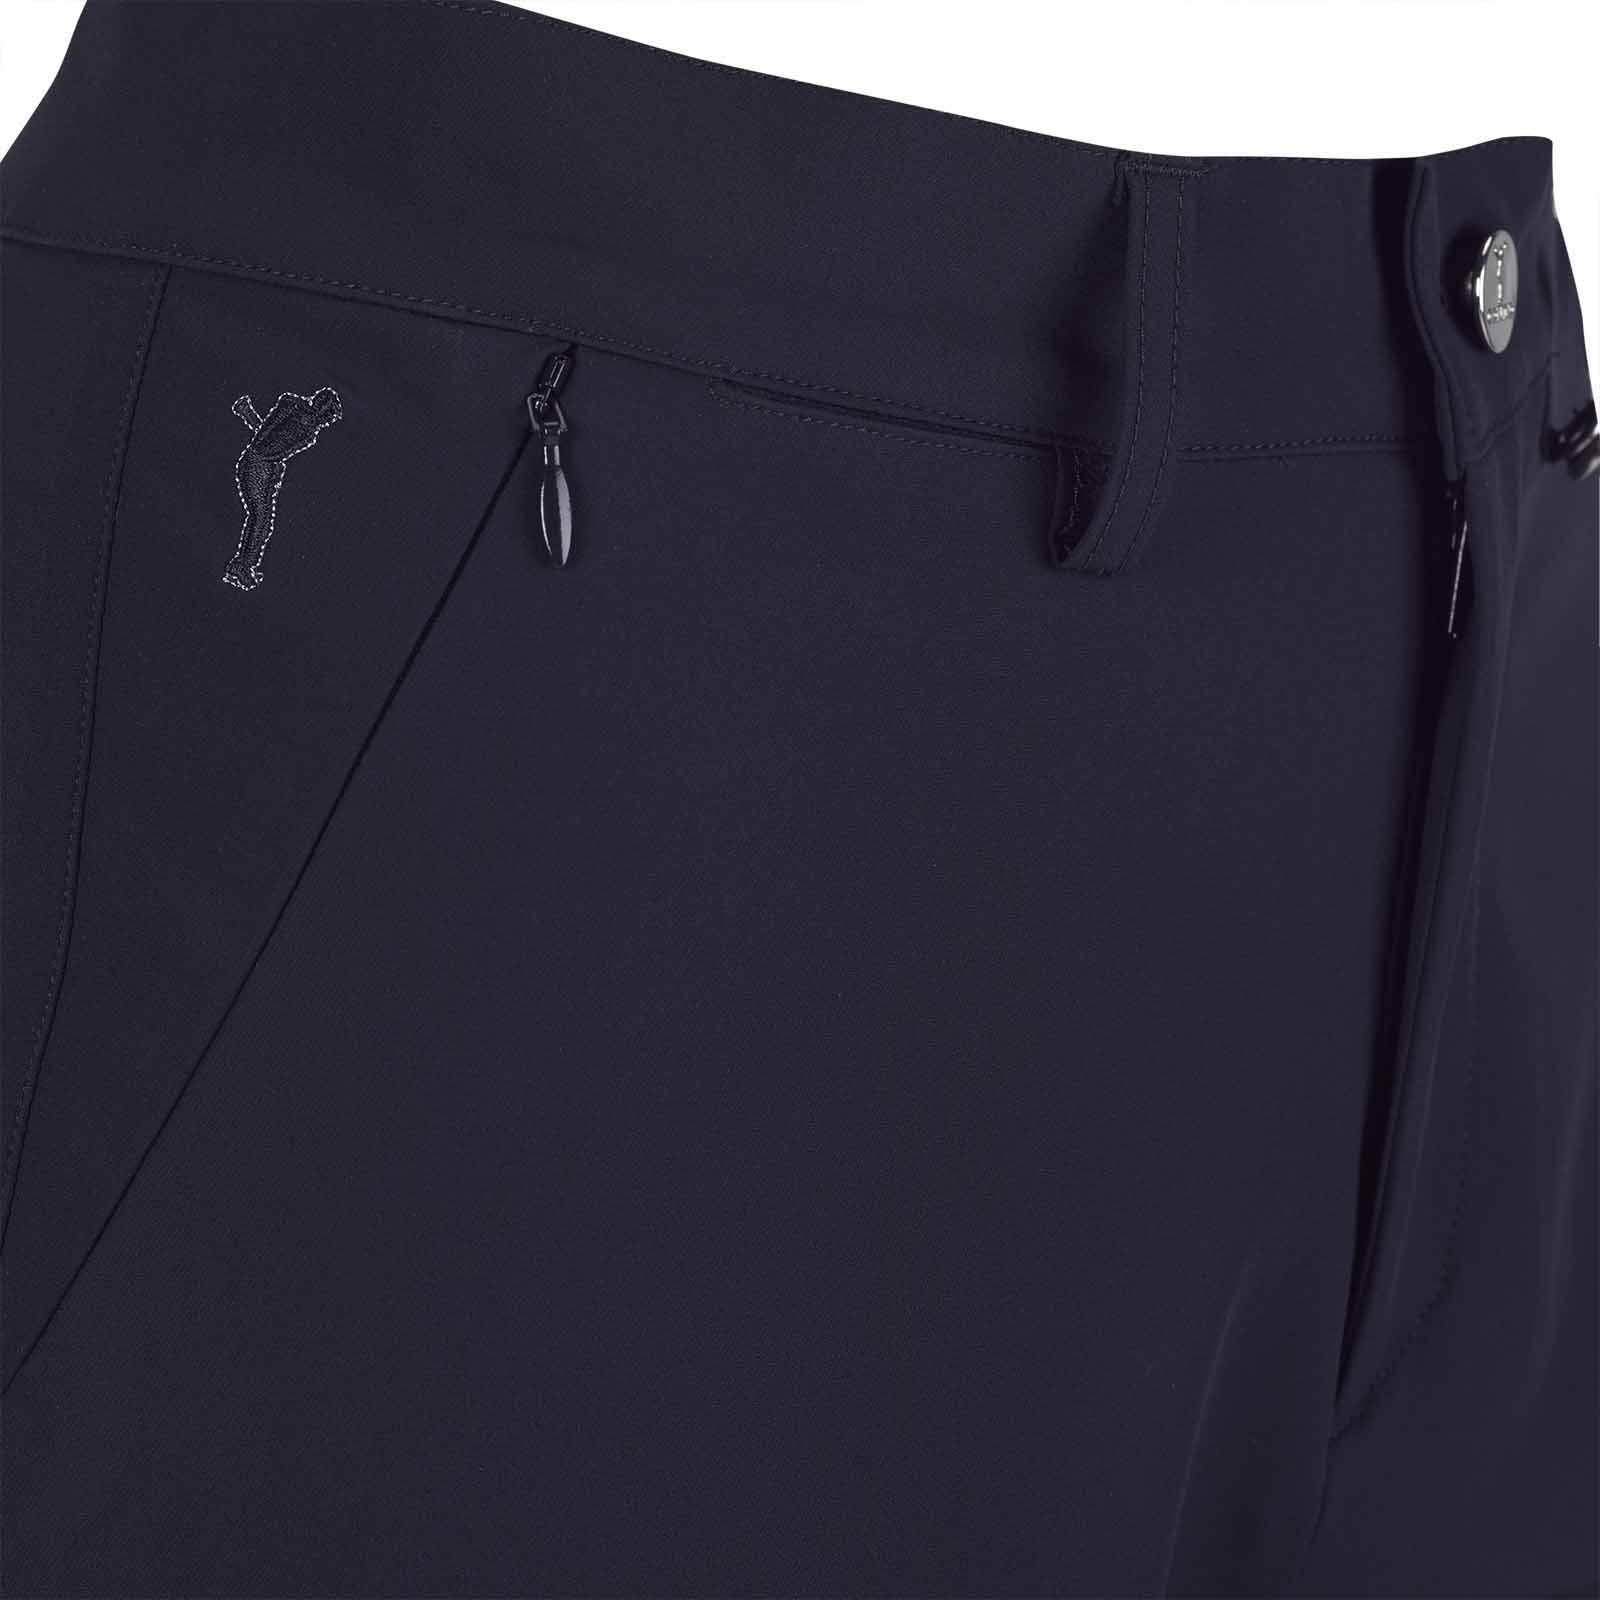 Damen 7/8-Golfhose schnelltrocknend aus leichtem Stretch-Material